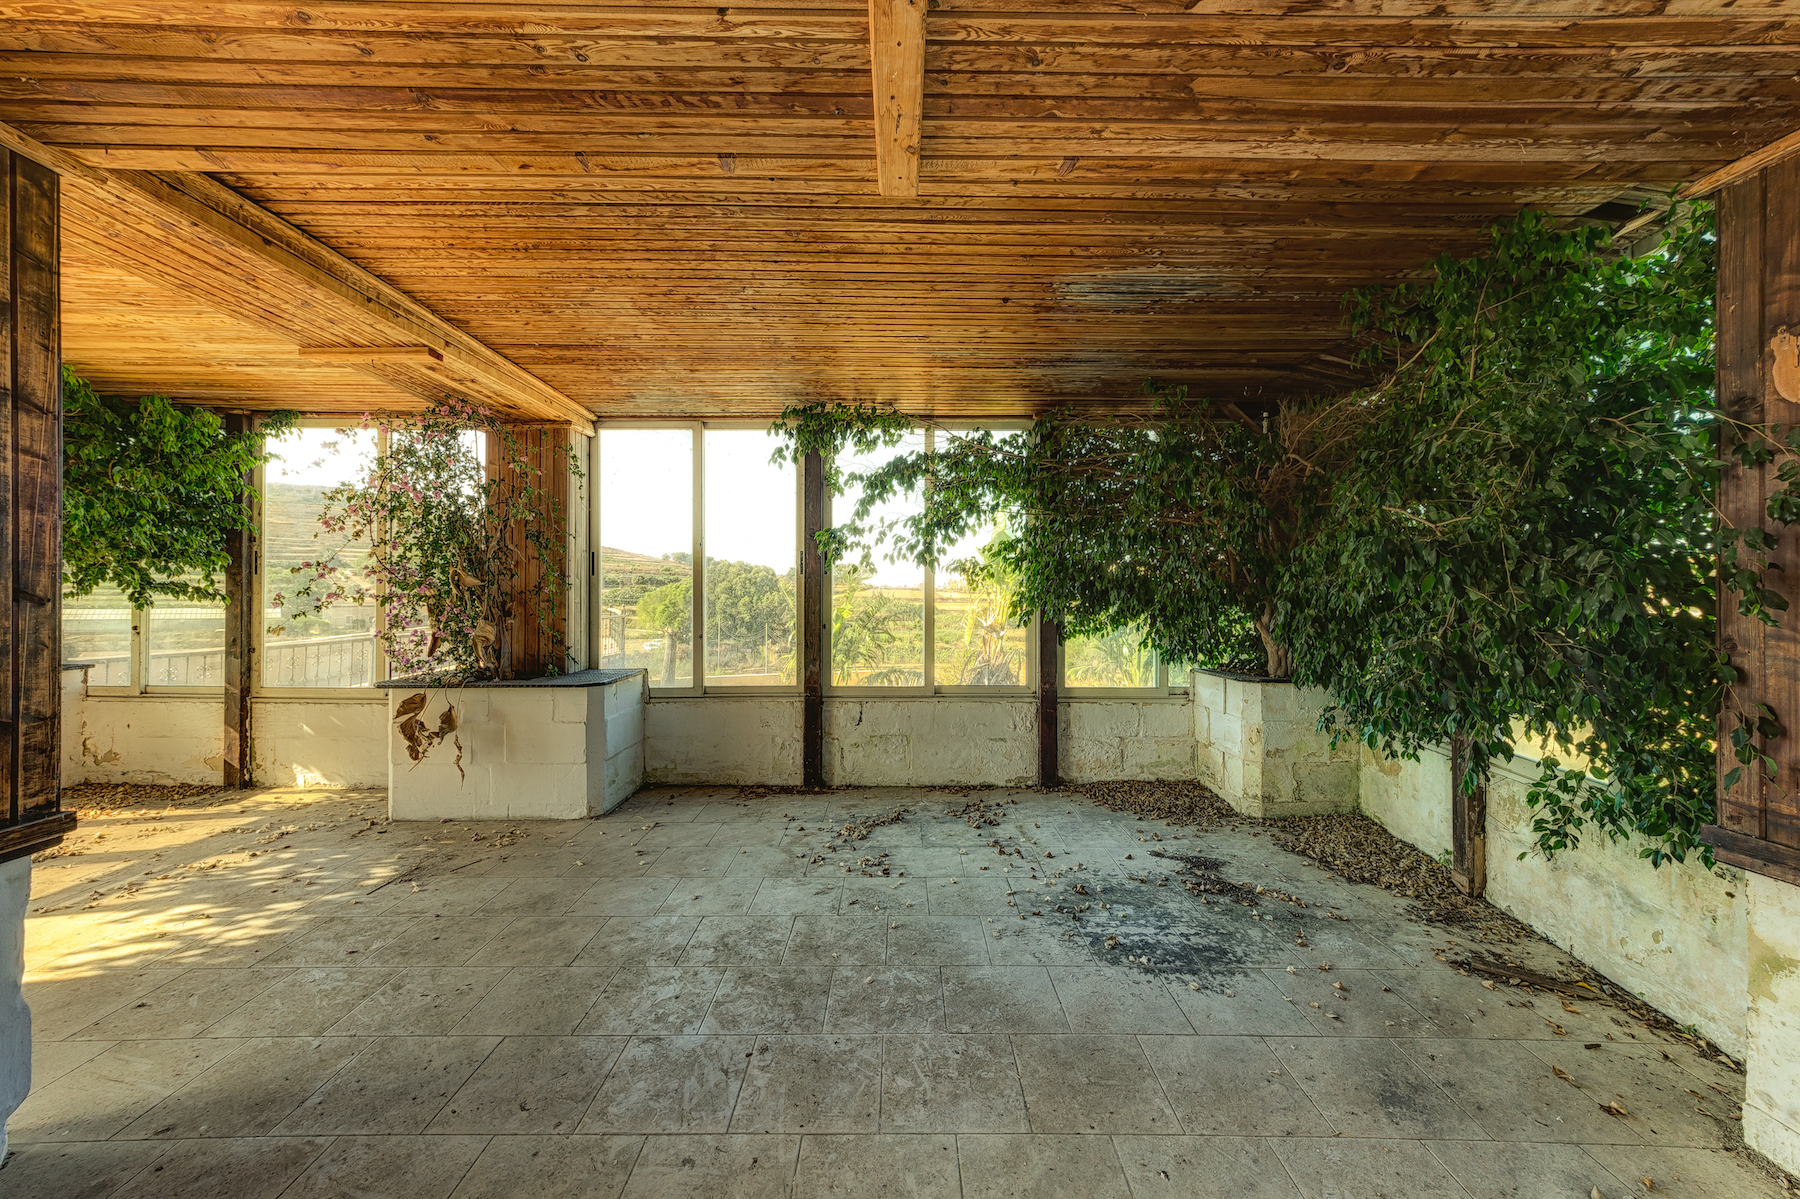 Trees in abandoned buildings by Stefan Baumann